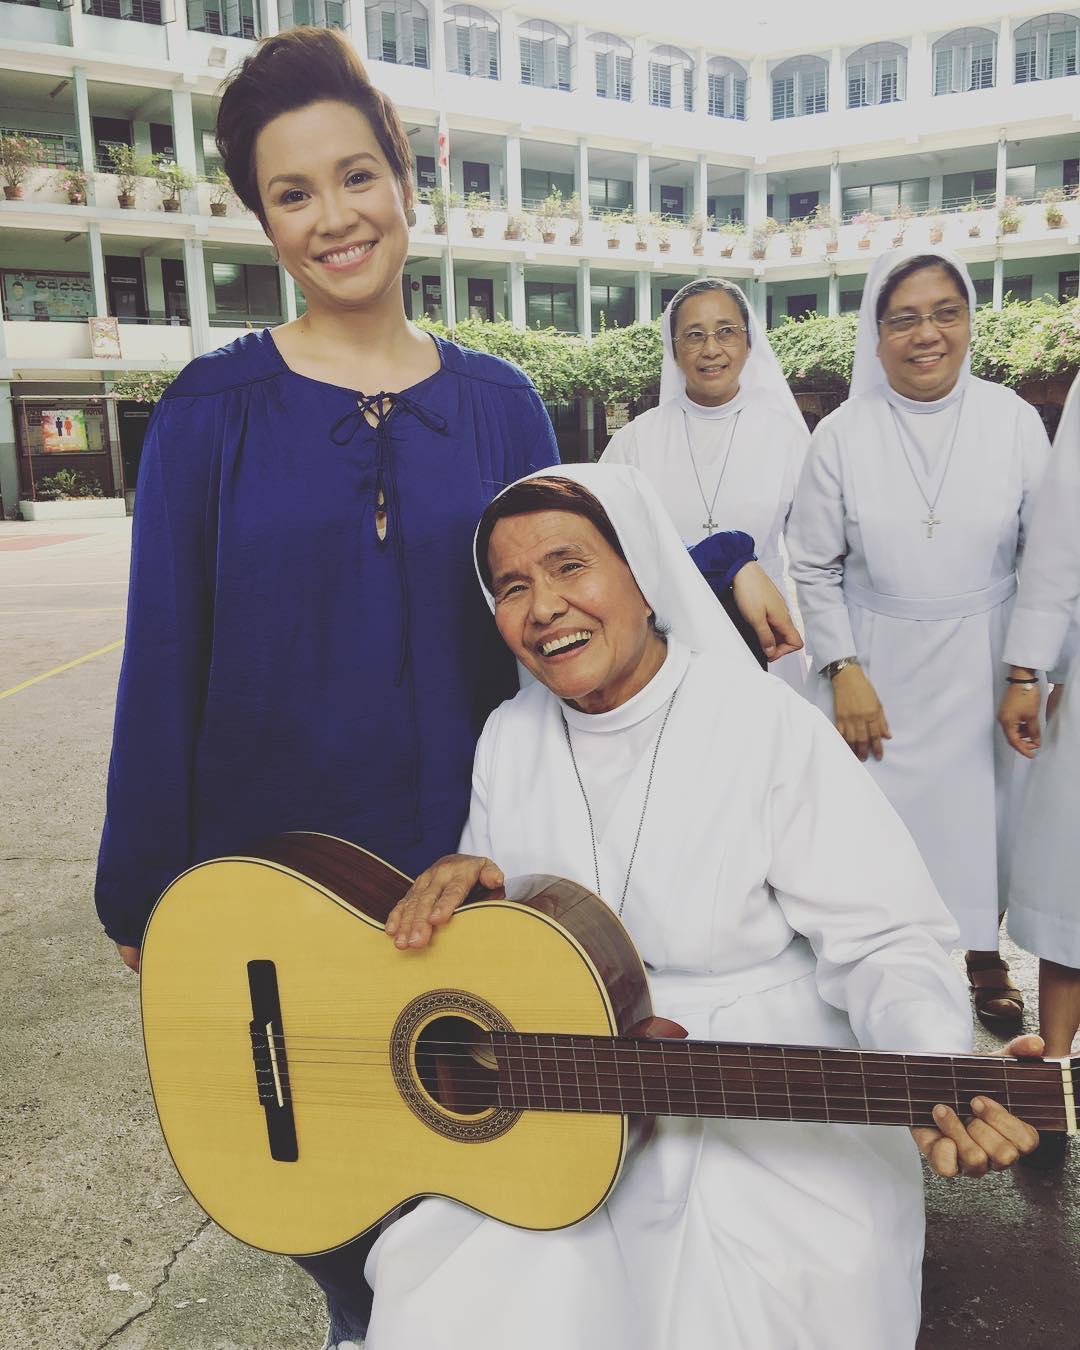 2017 Summer SID PHOTOS: The Voice Teens Coaches jam with Sister Rocker Gloria Agagon